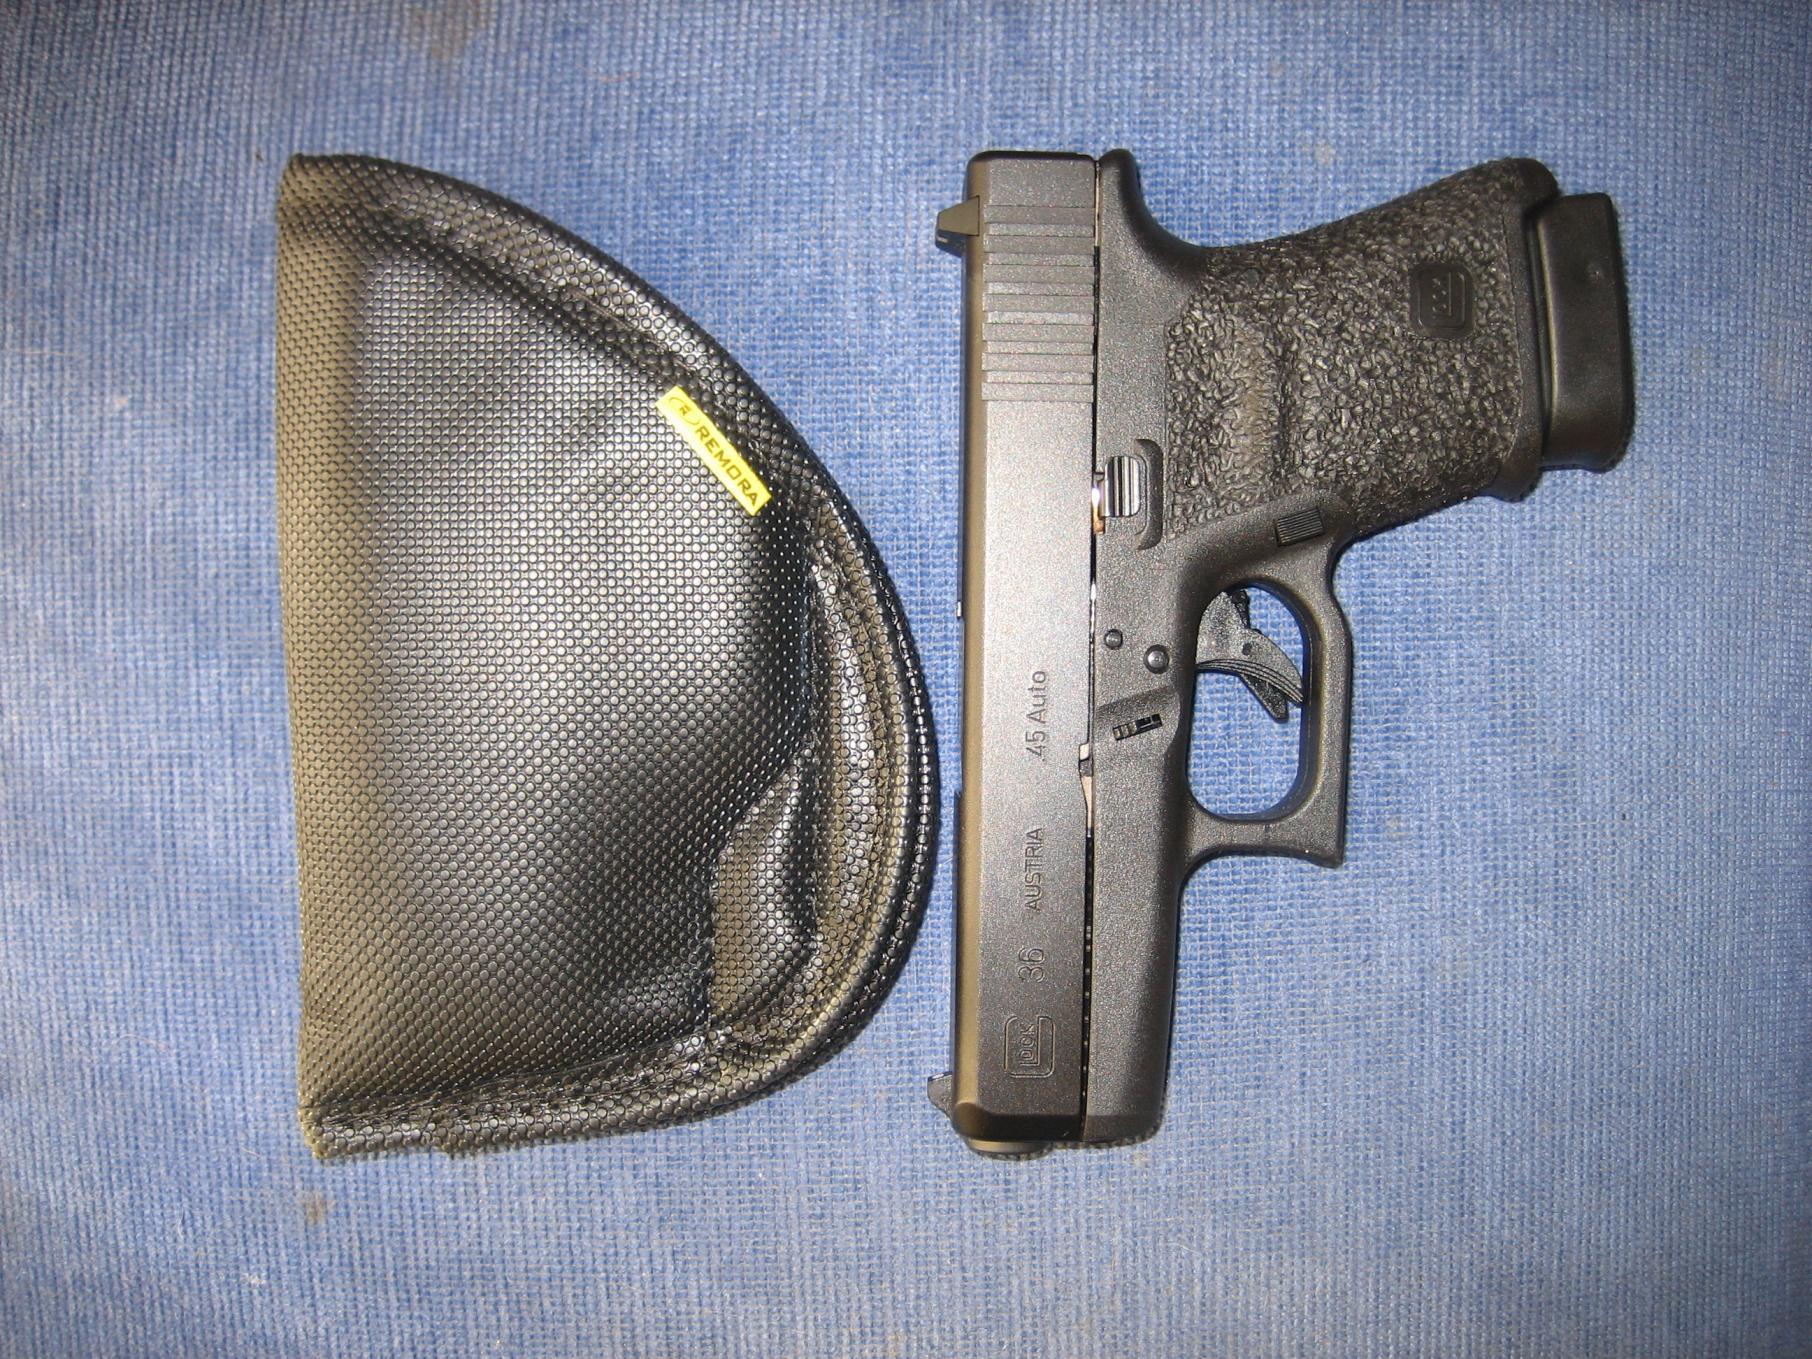 glock 36-remora-003.jpg